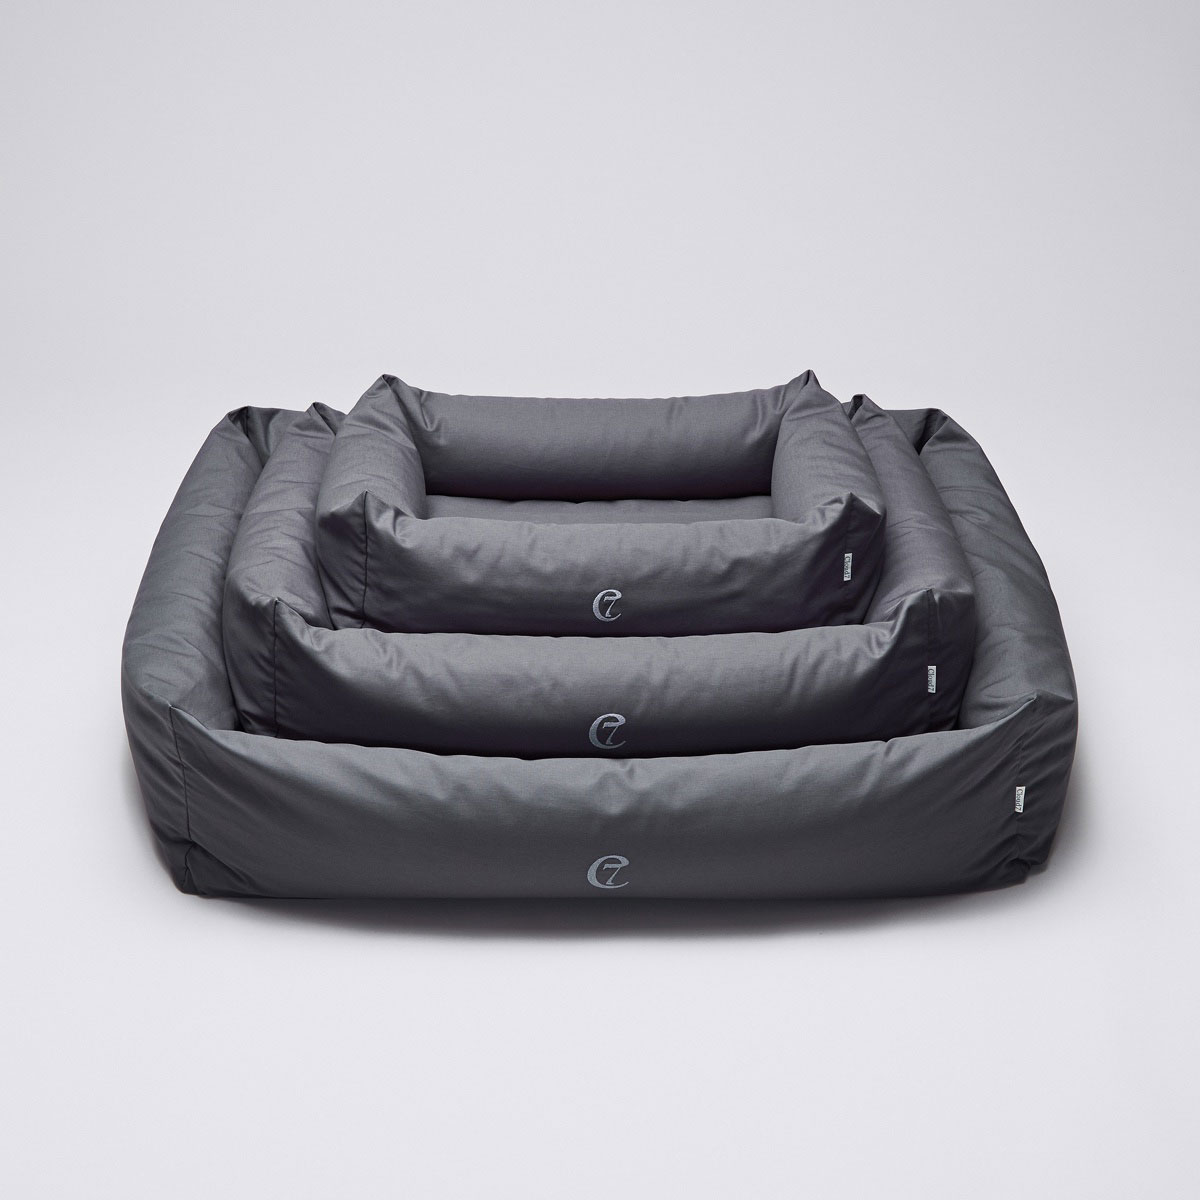 Cloud7 Award Dog Bed